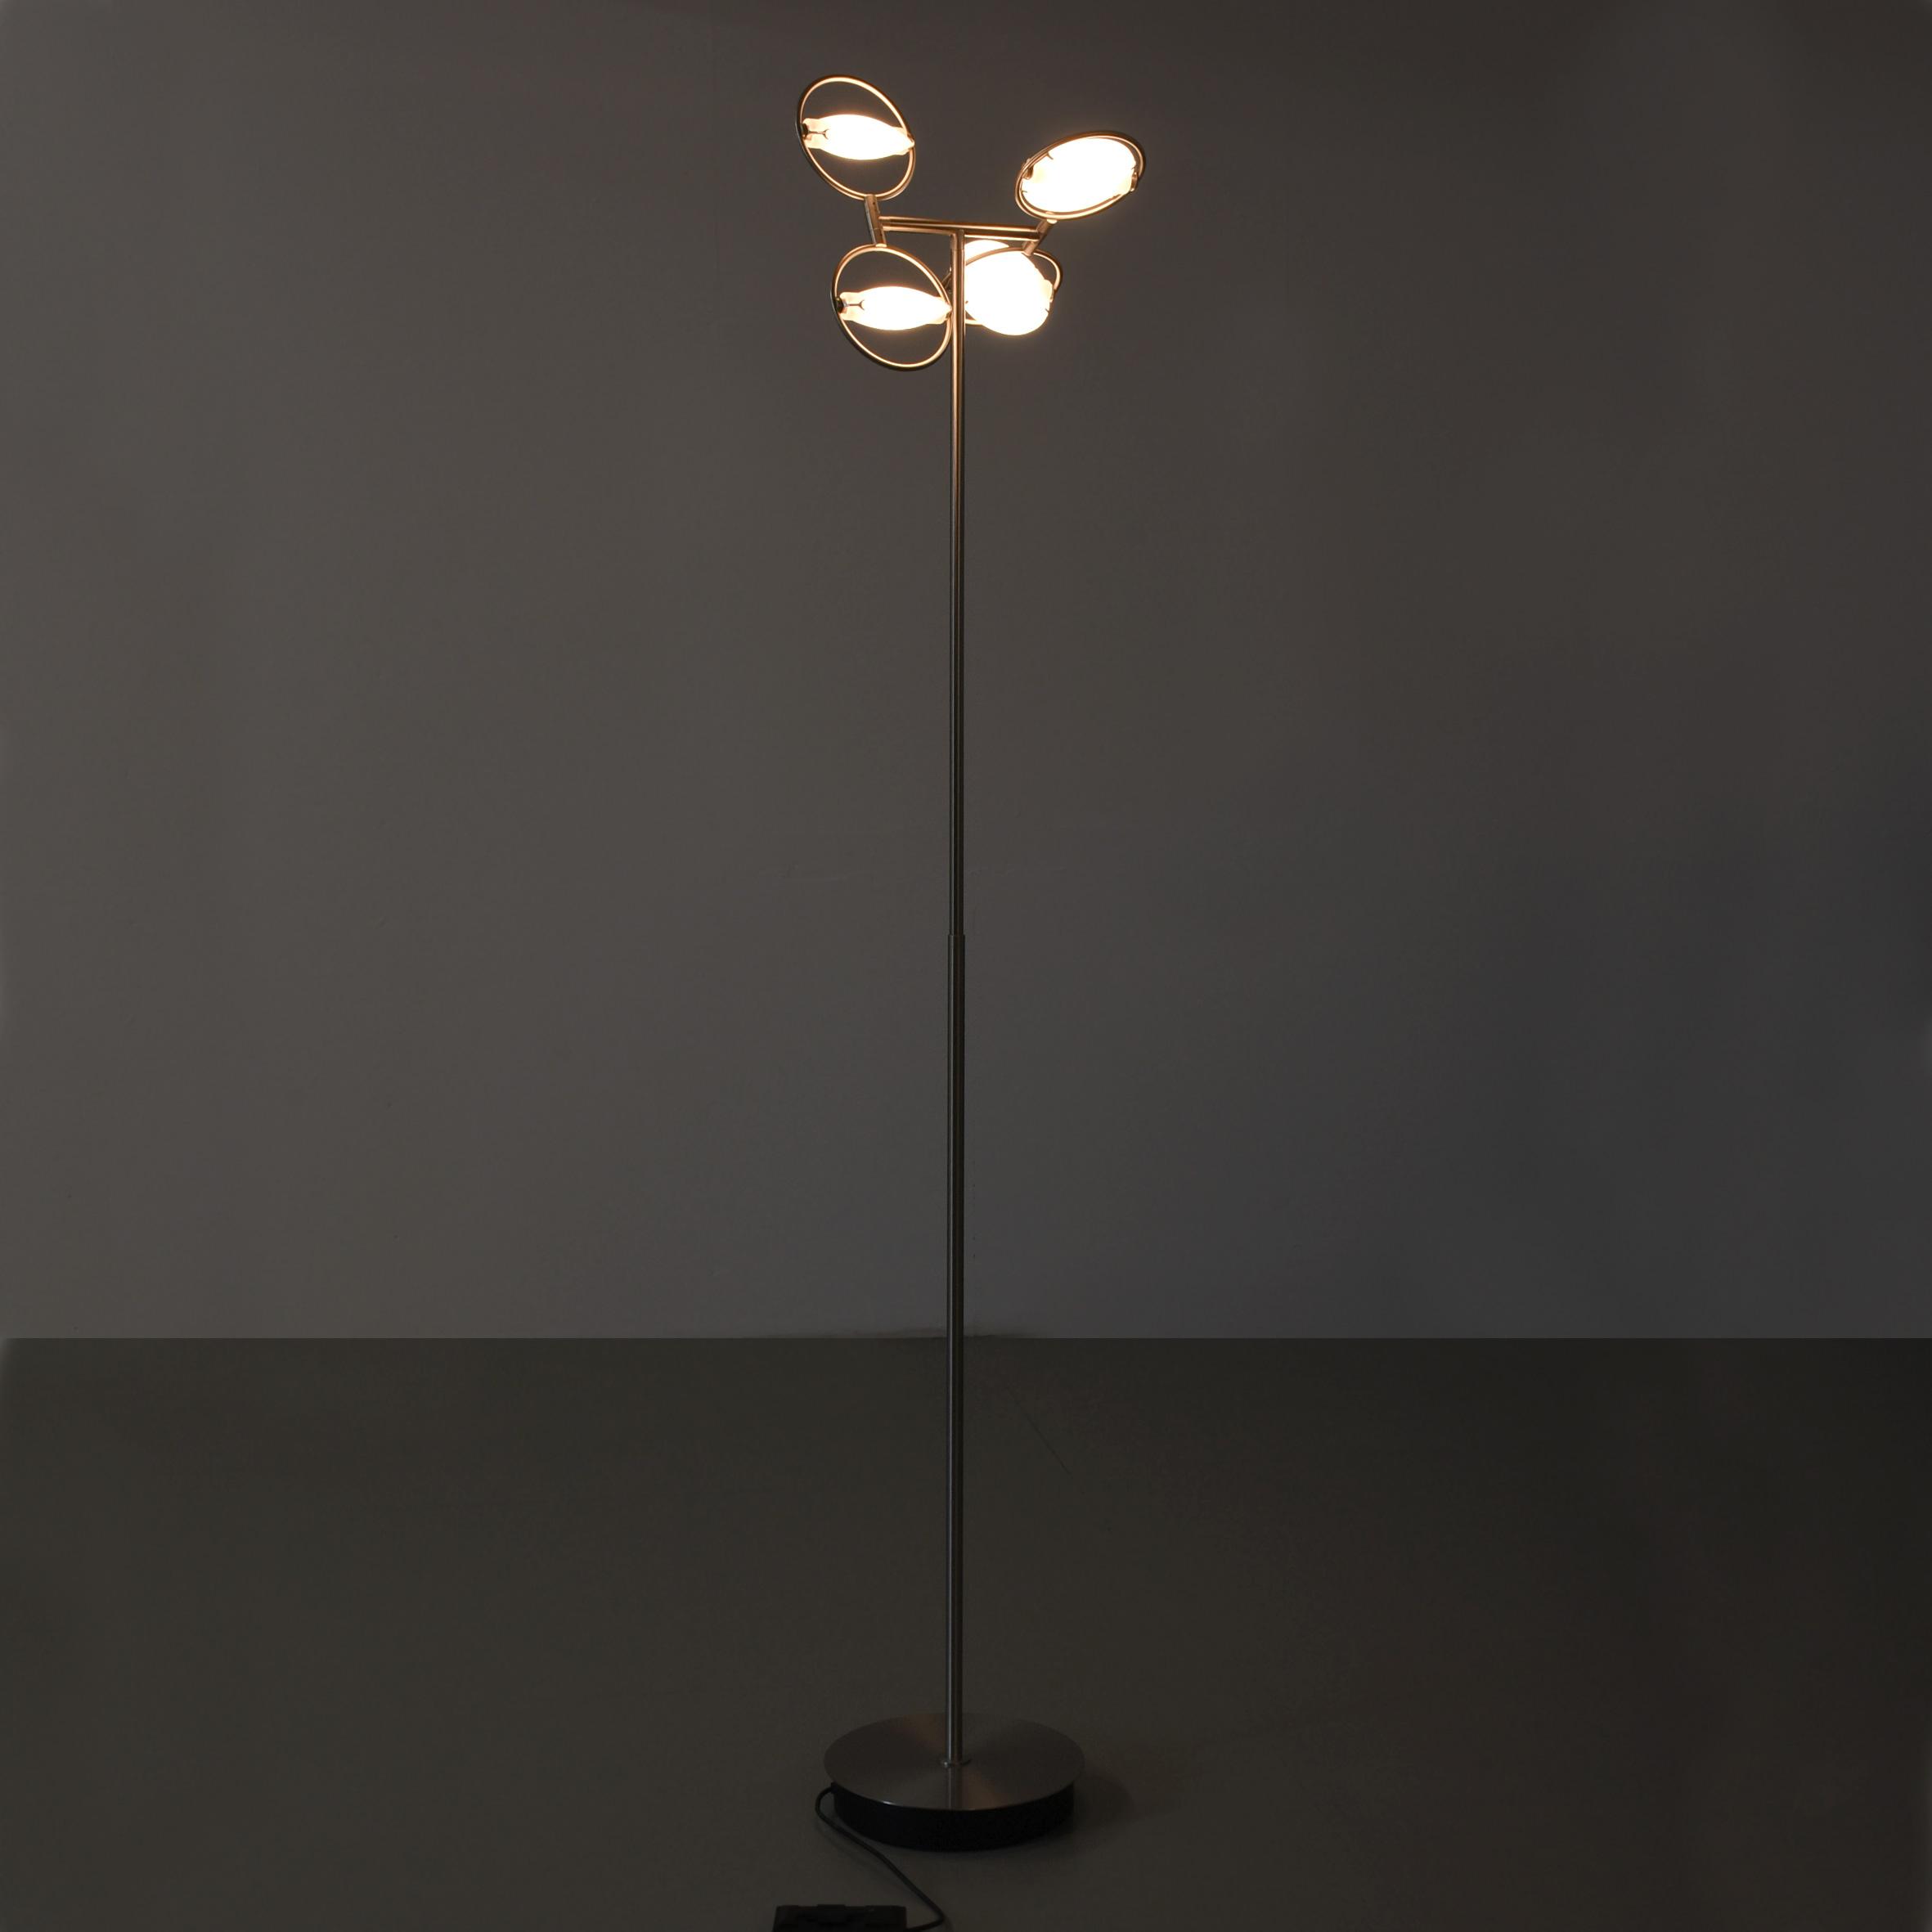 Stehlampe Dimmbar Chromfuss Geburstet 4 Ovale Leuchten Variabel